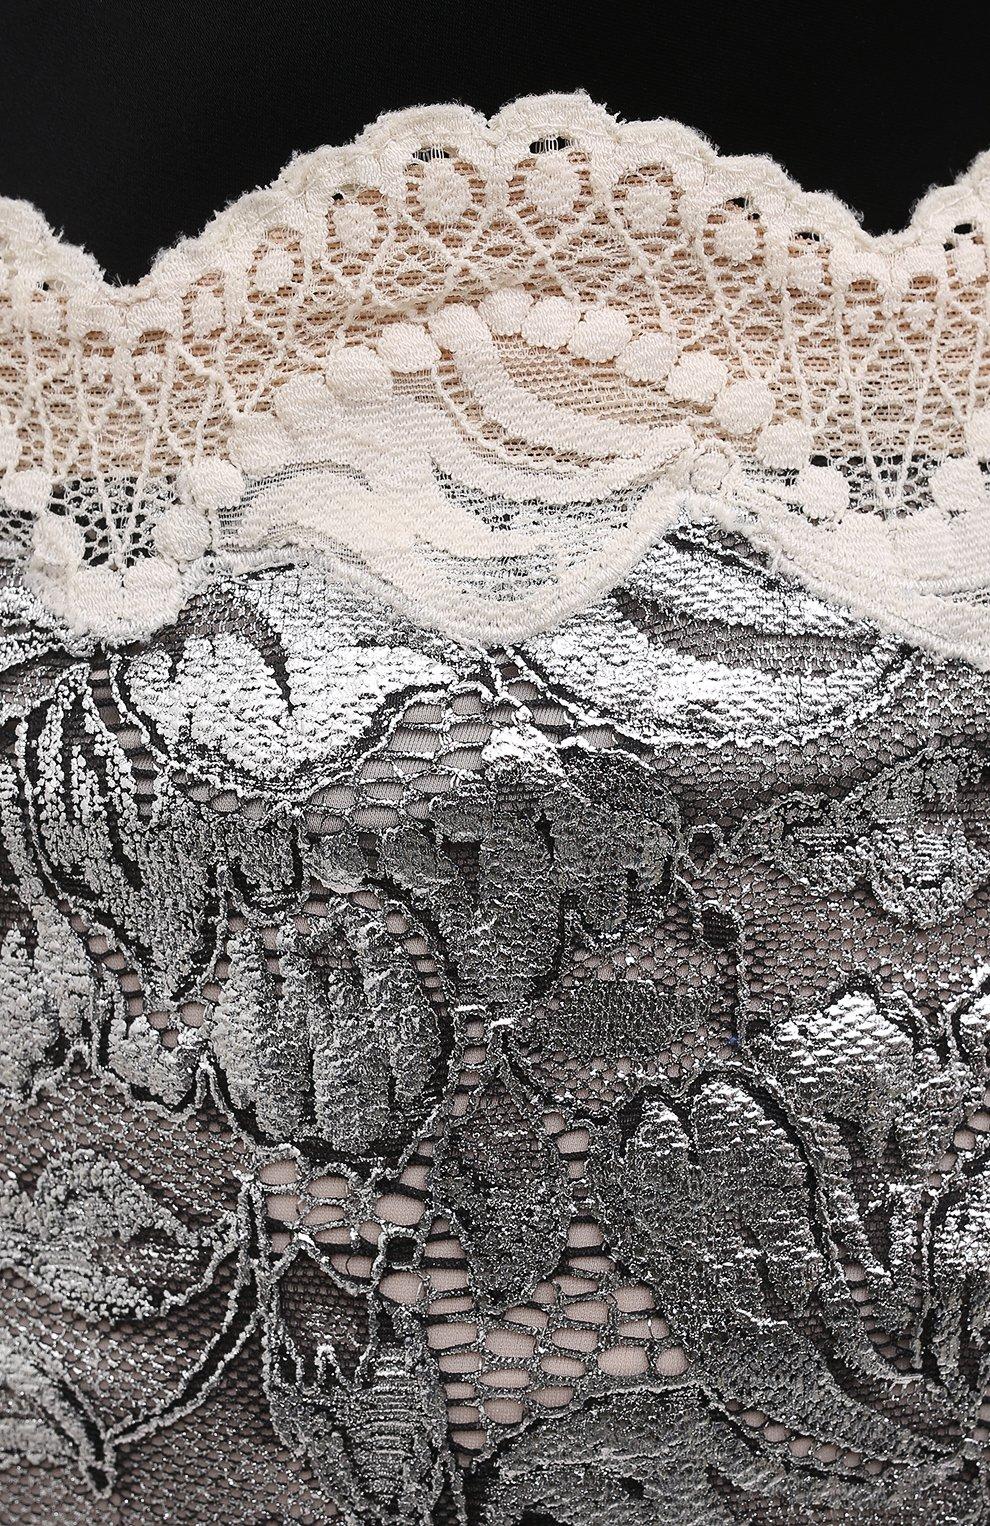 Женская юбка PACO RABANNE серебряного цвета, арт. 21EJJU201PA0173 | Фото 5